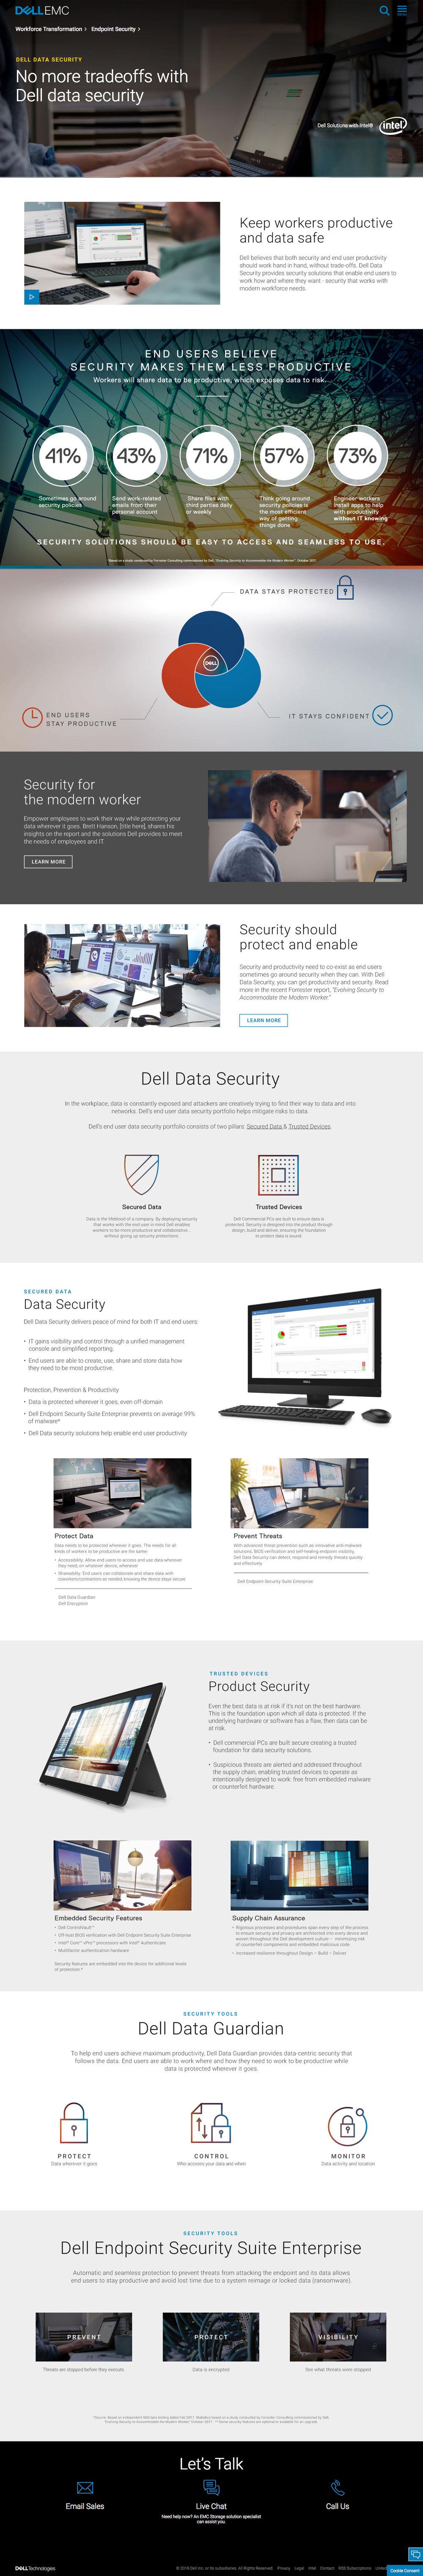 11303_Security_Pg_Wireframe-NO-STICKIES.jpg